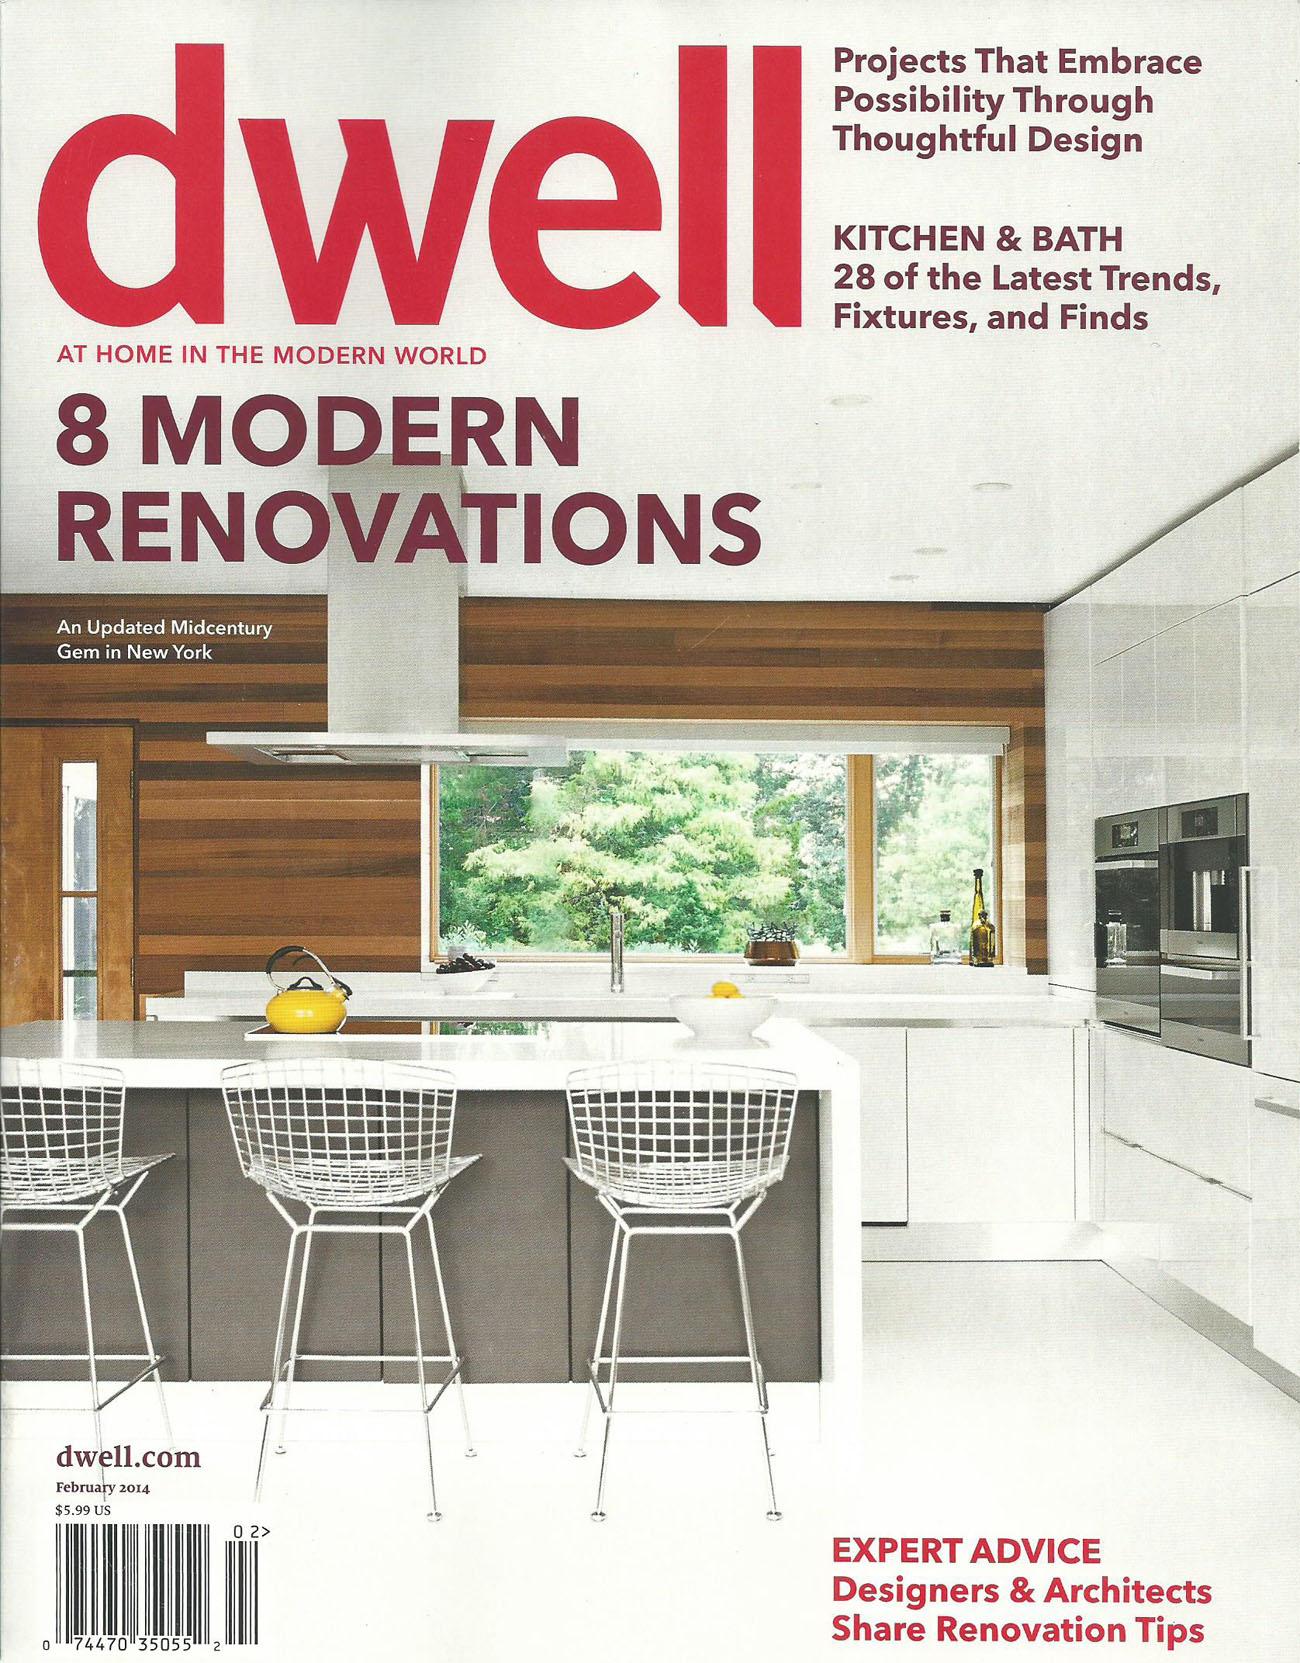 2014_Feb_dwell_cover copy